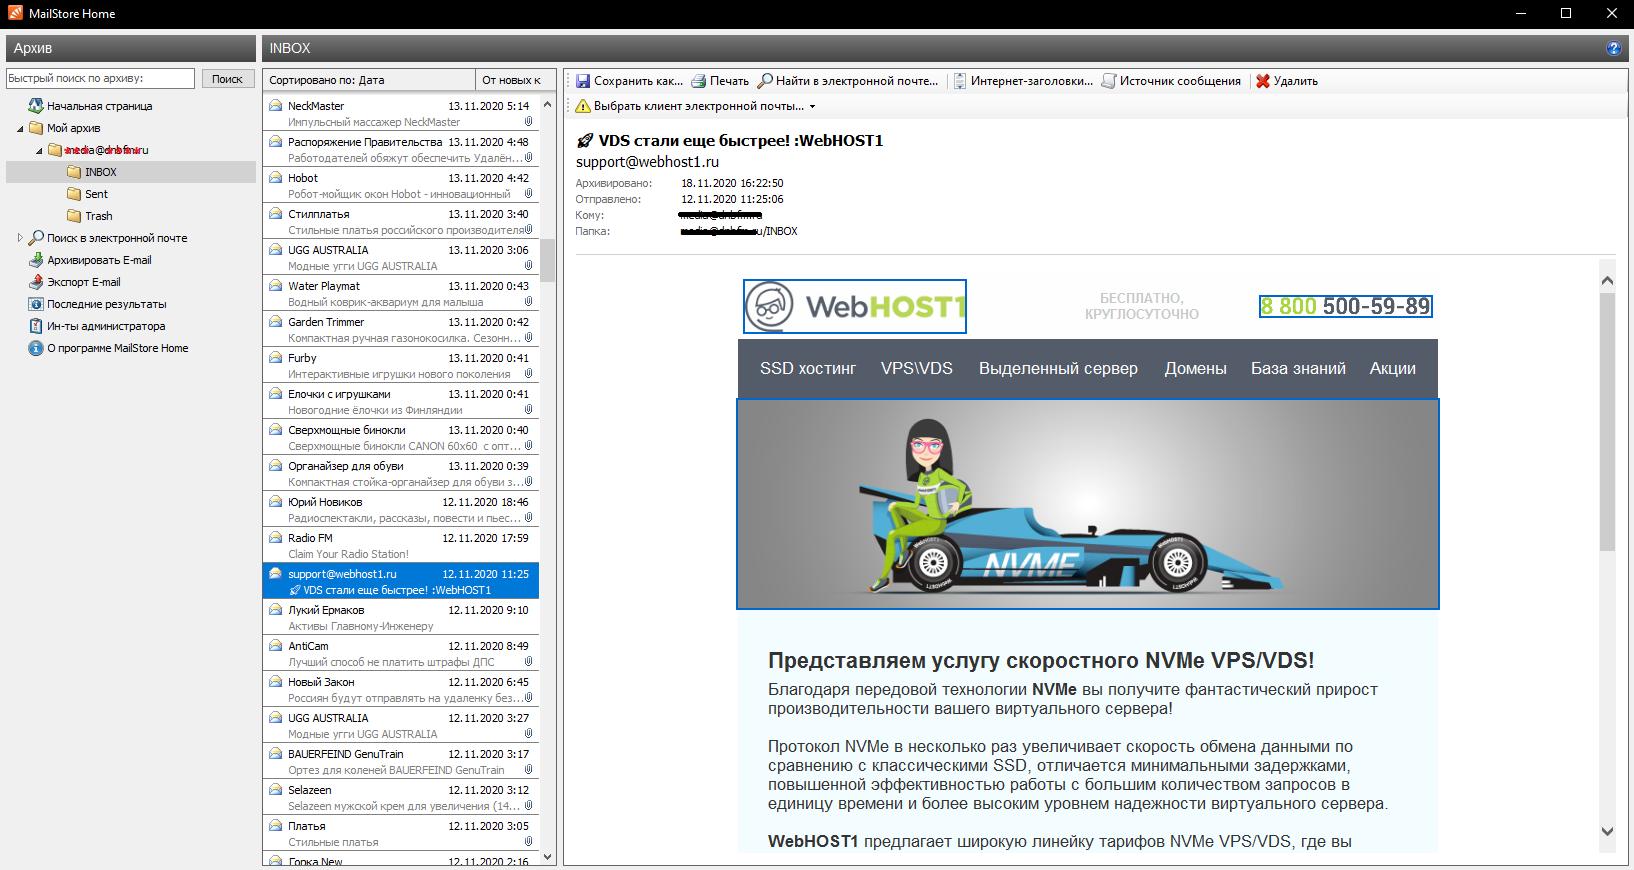 https://webhost1.ru/upload/help/mail/mailstore/4.png